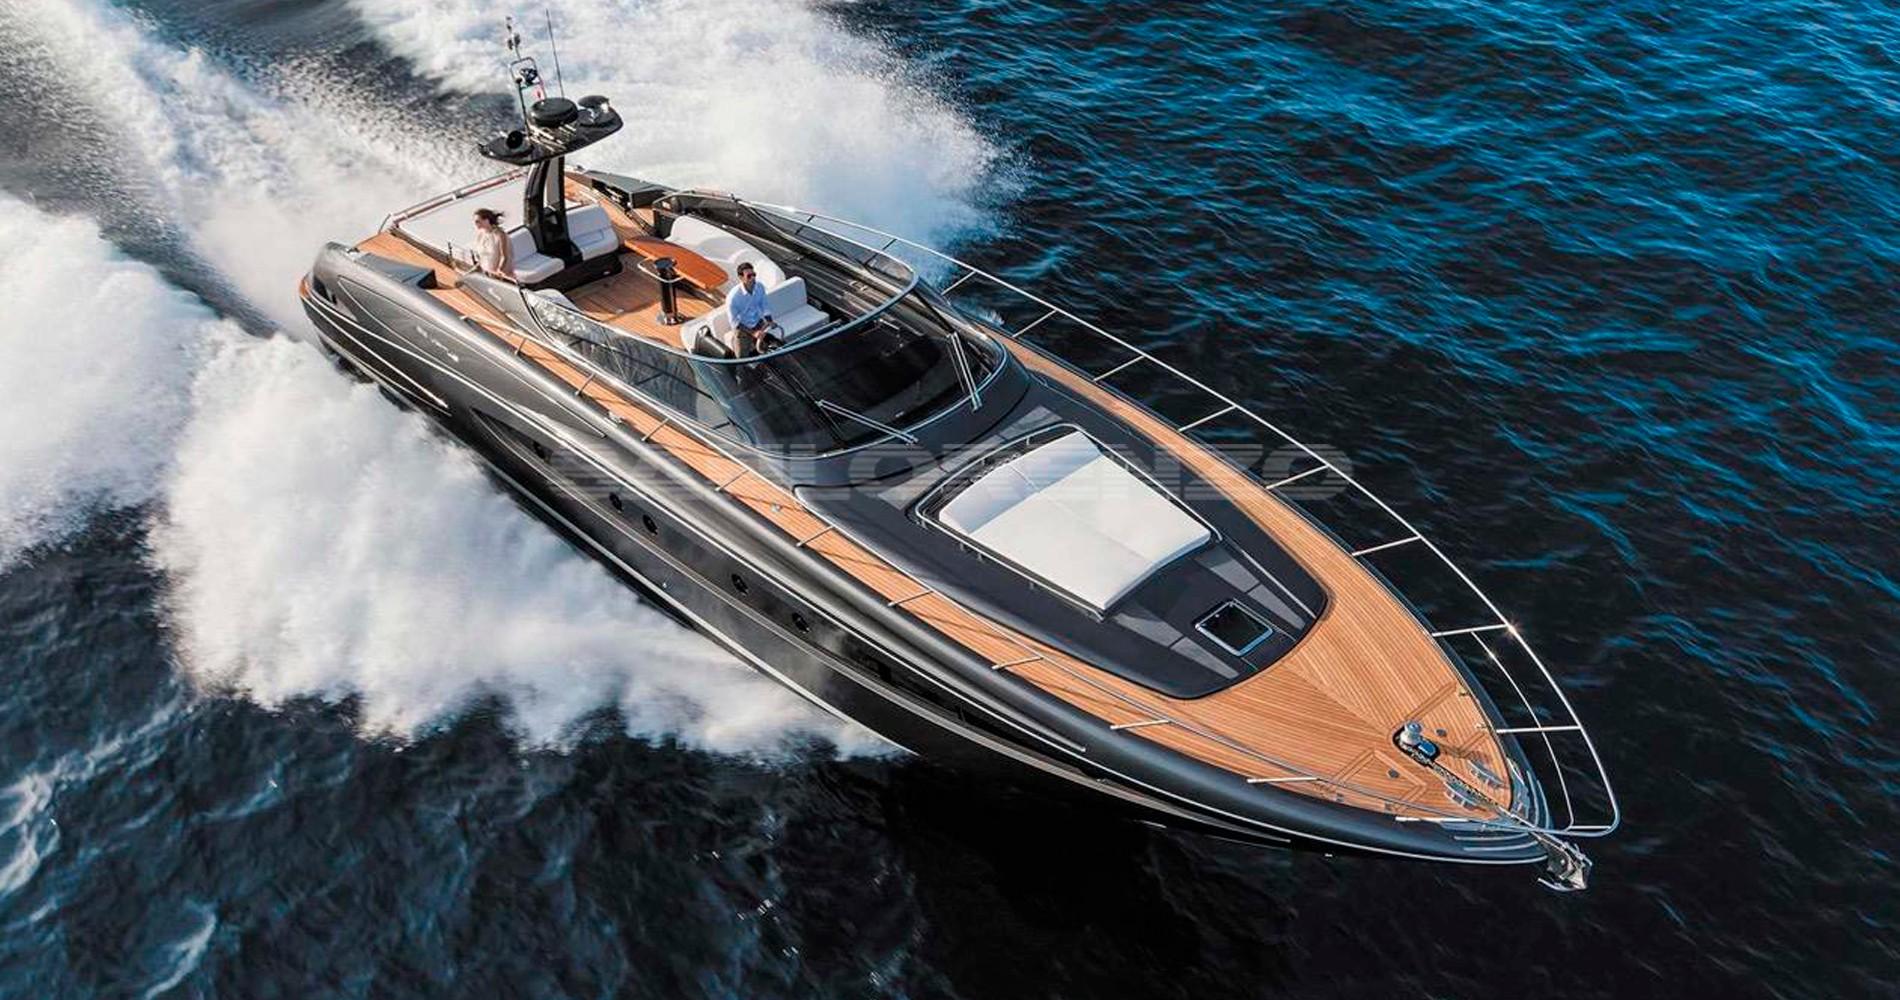 Riva Virtus 63 - 2013 - Used Boat